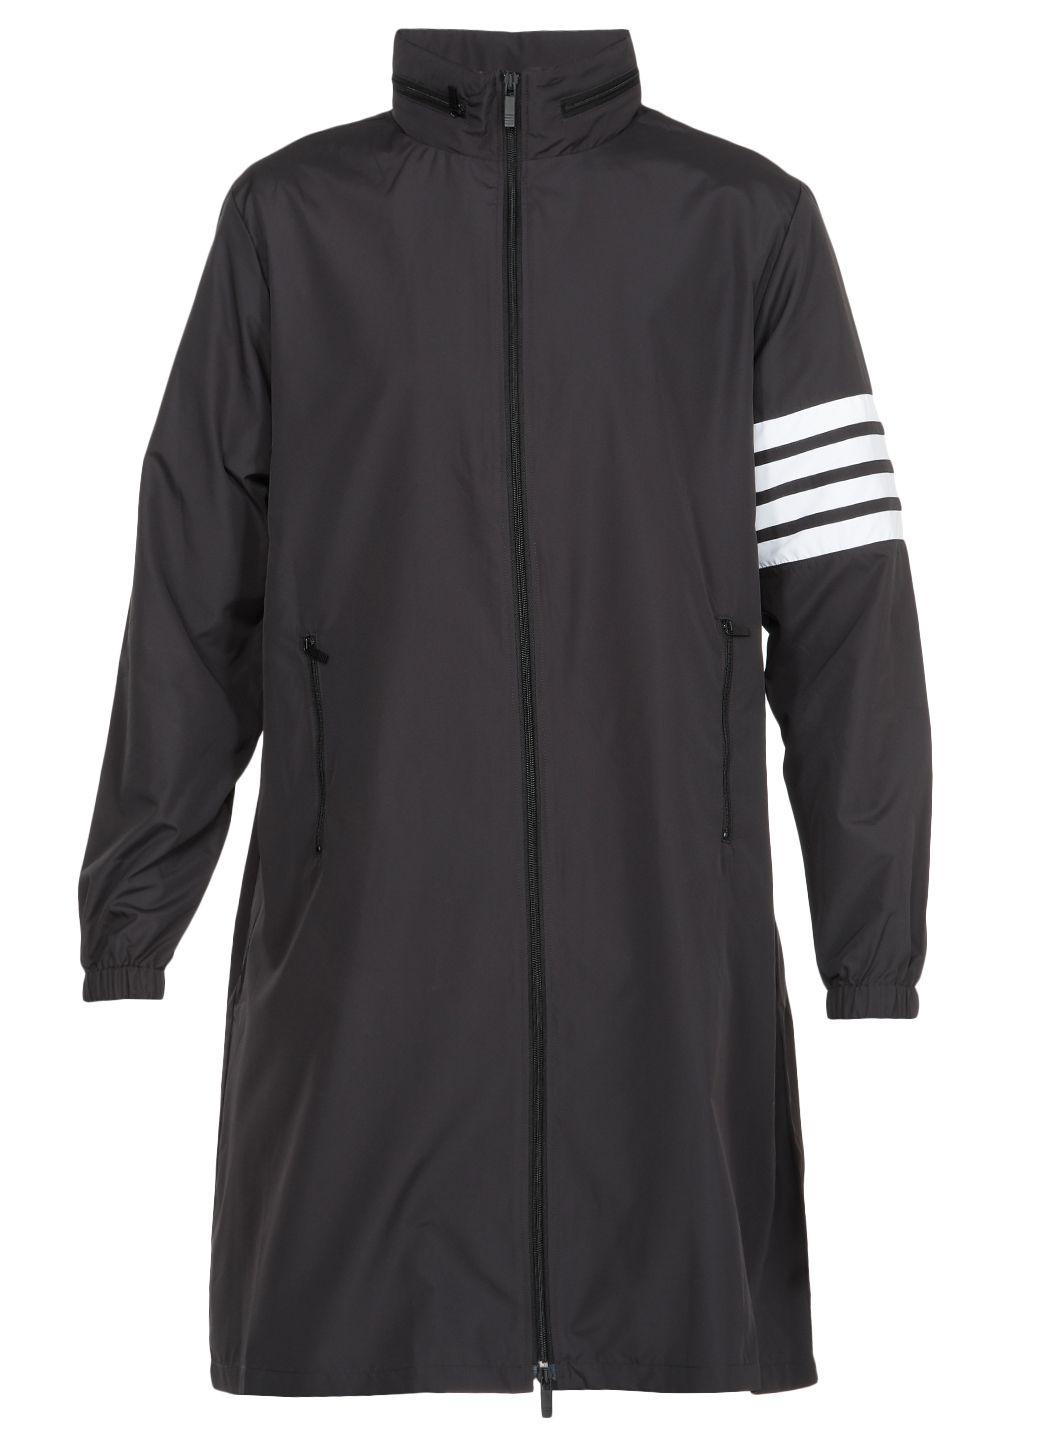 Tech fabric jacket